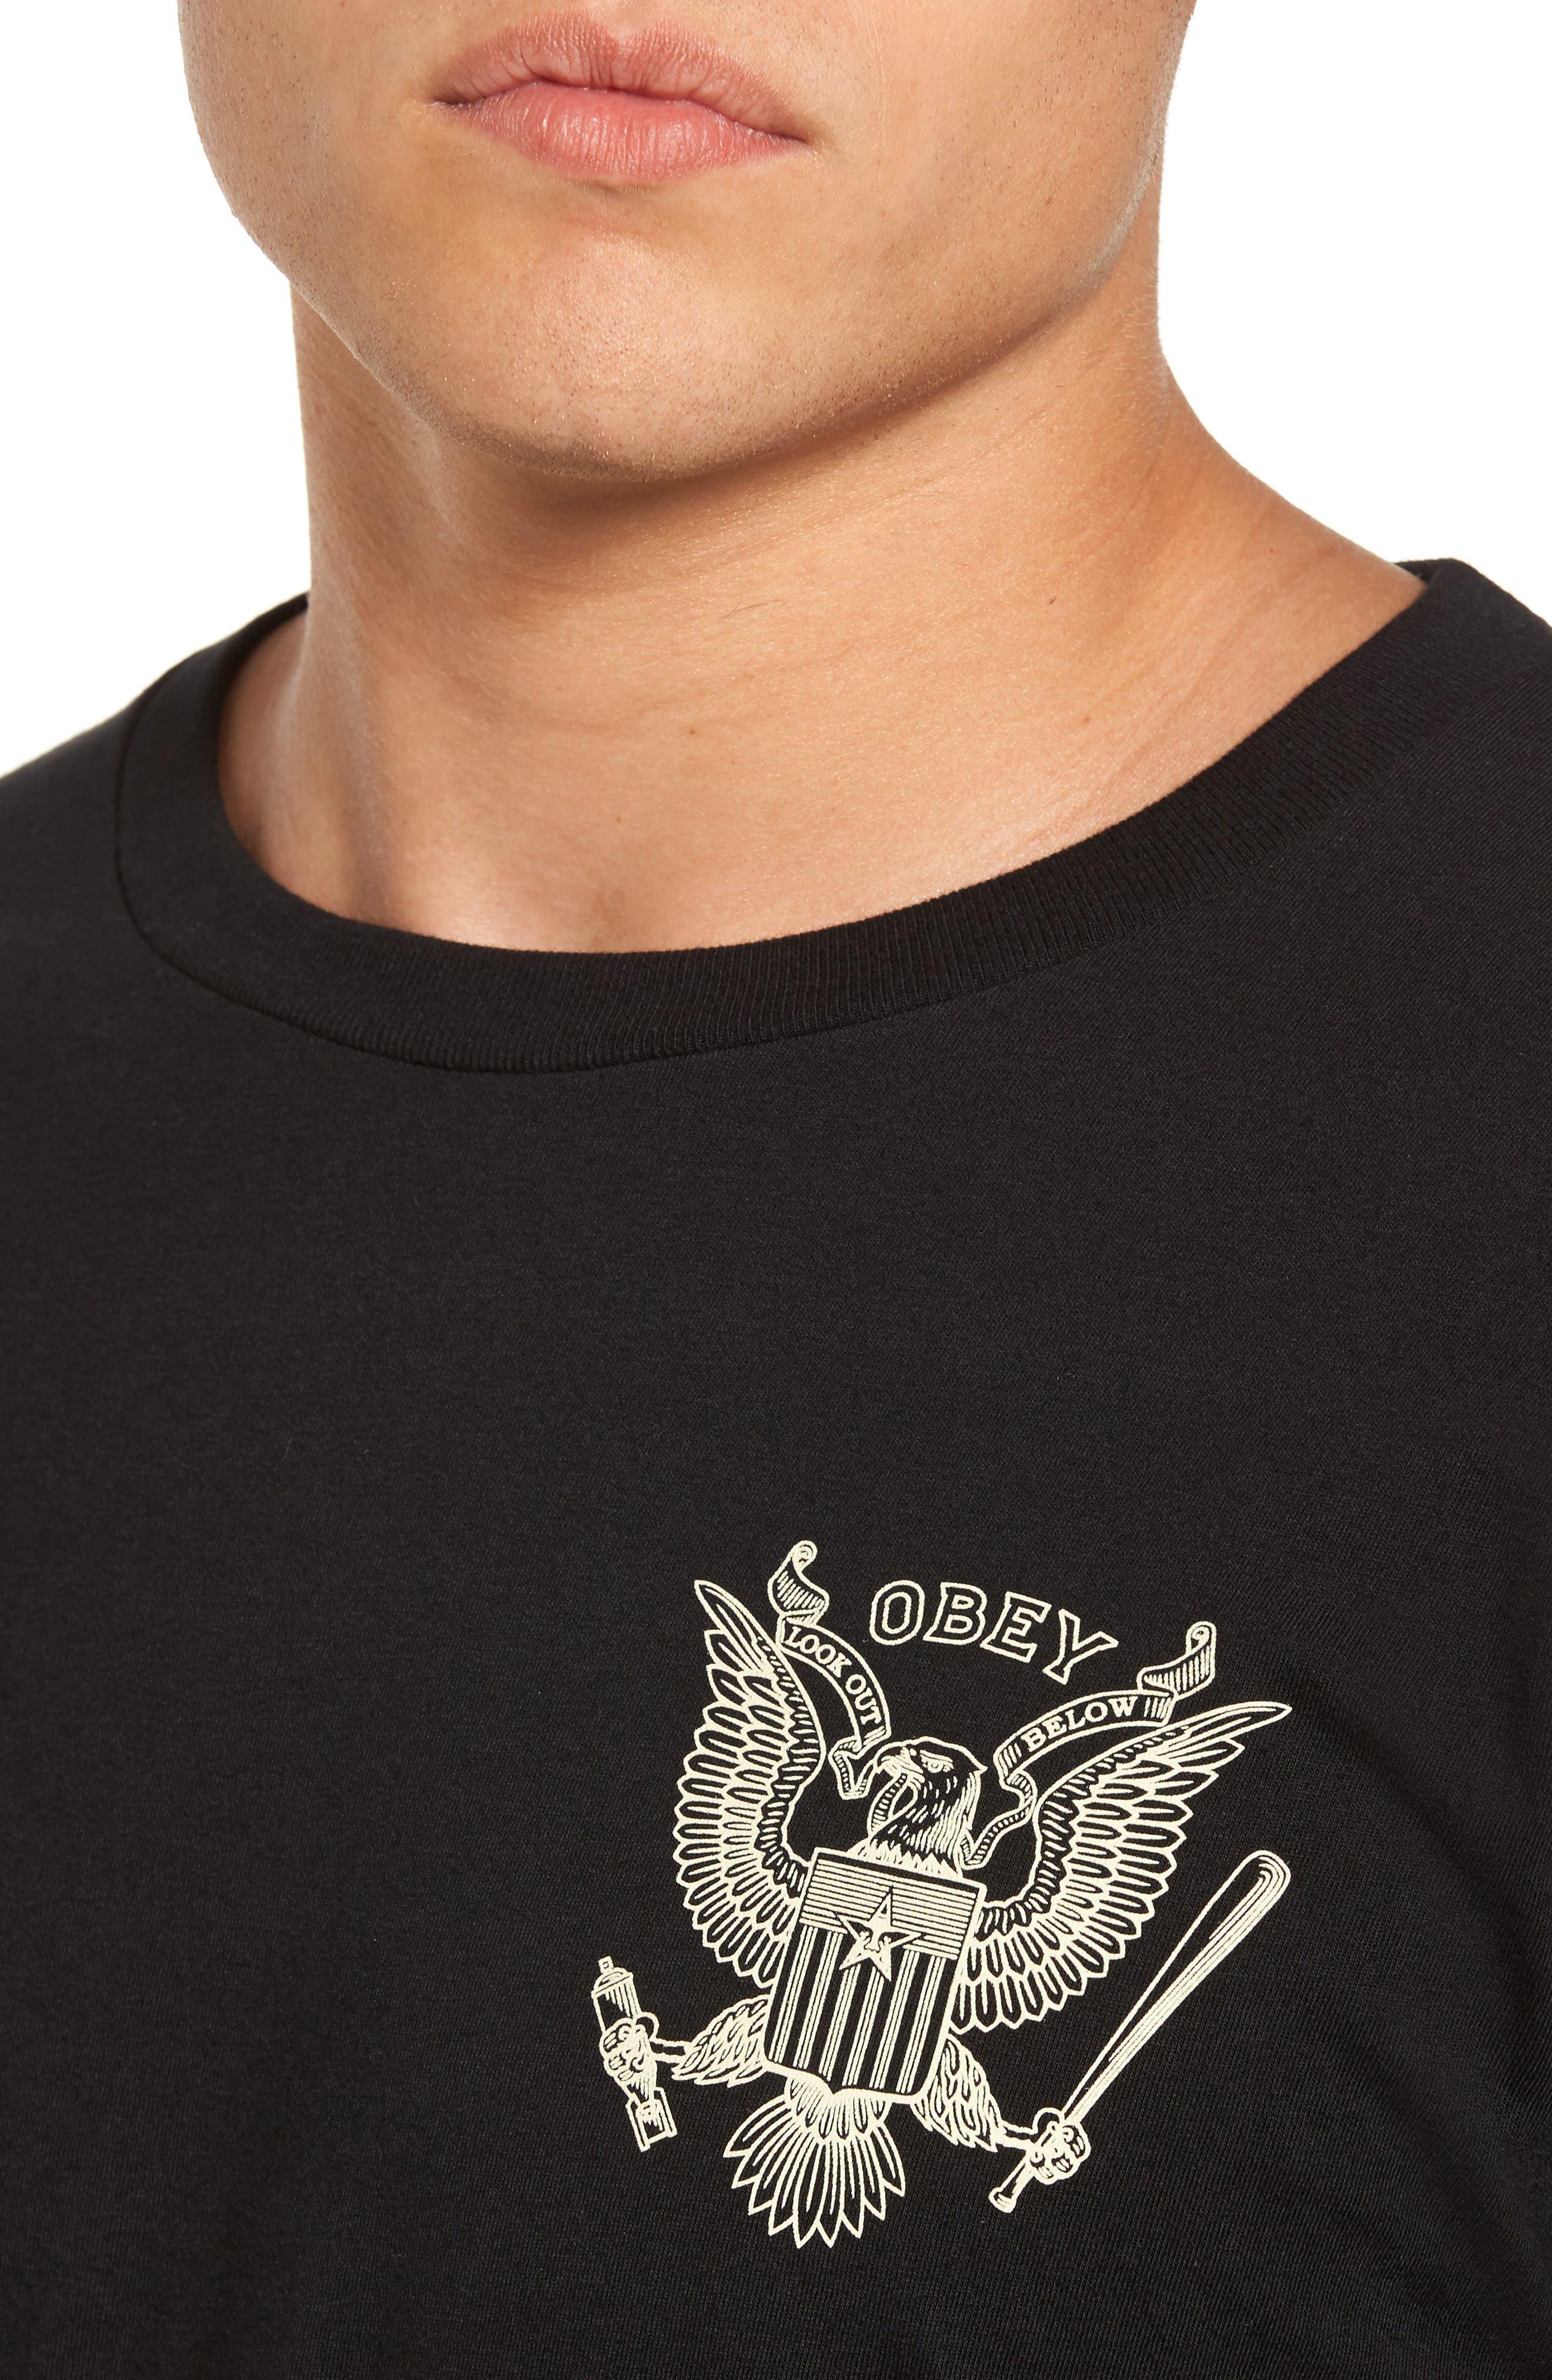 Look Out Below Premium Graphic T-Shirt,                             Alternate thumbnail 4, color,                             Black